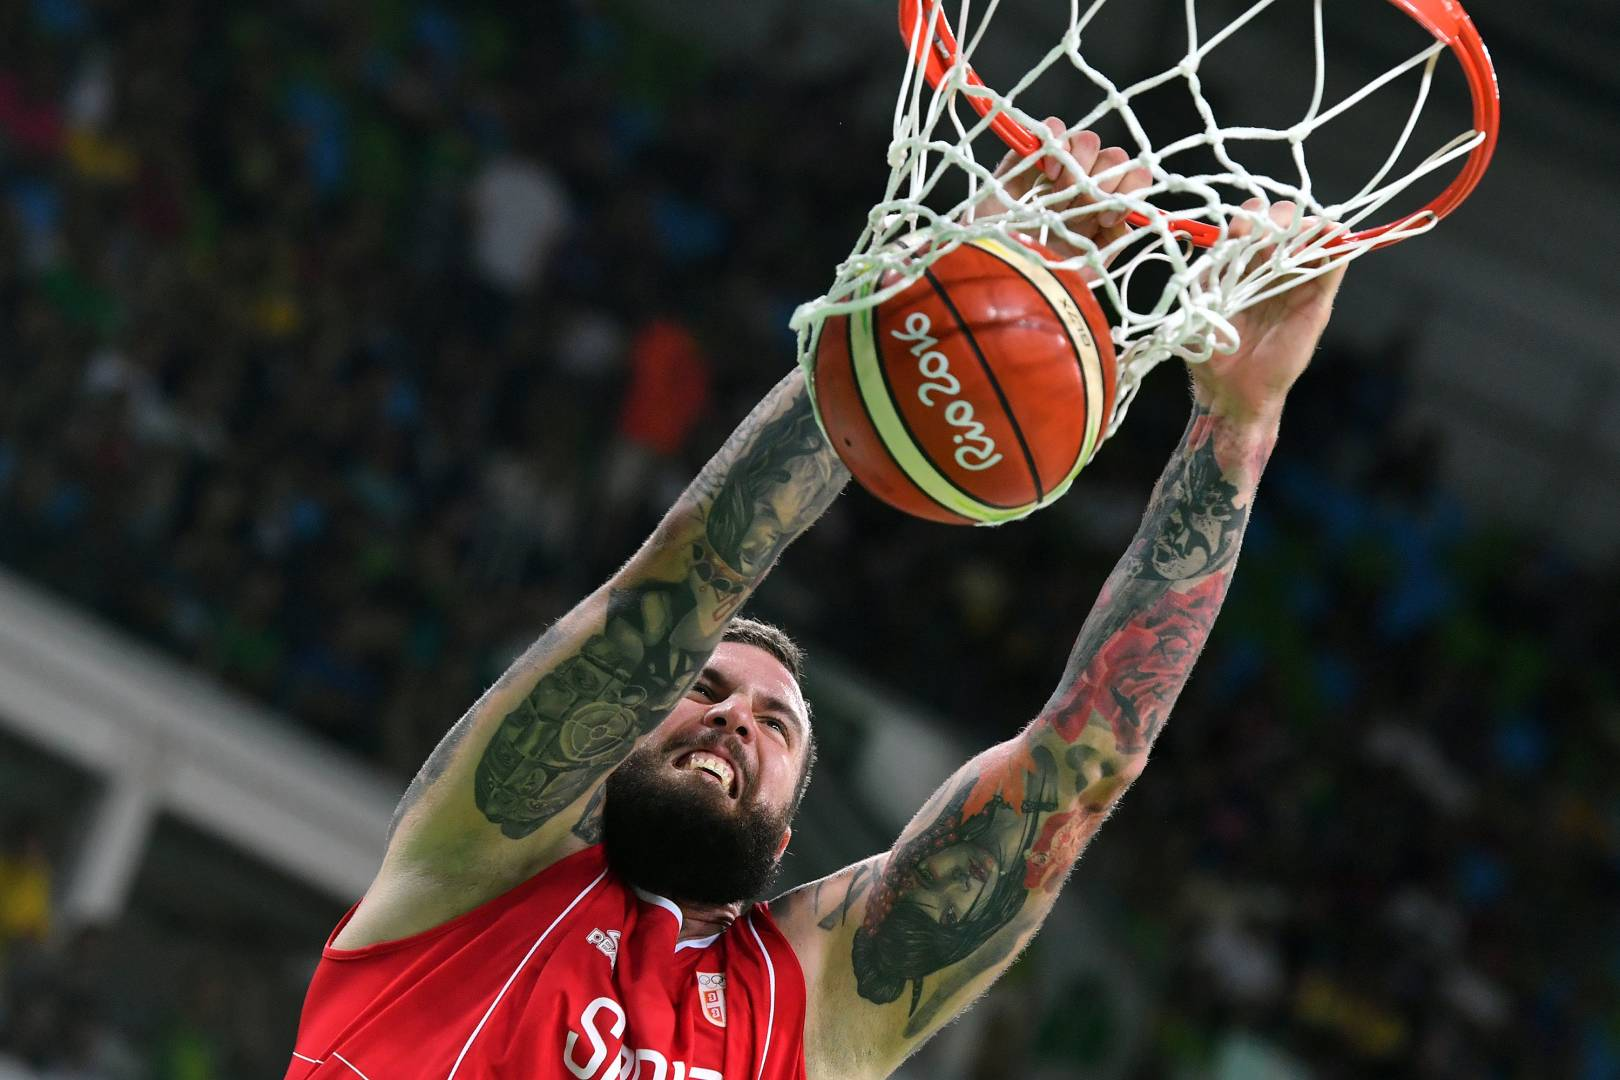 Rio-2016-Basketball-001.JPG